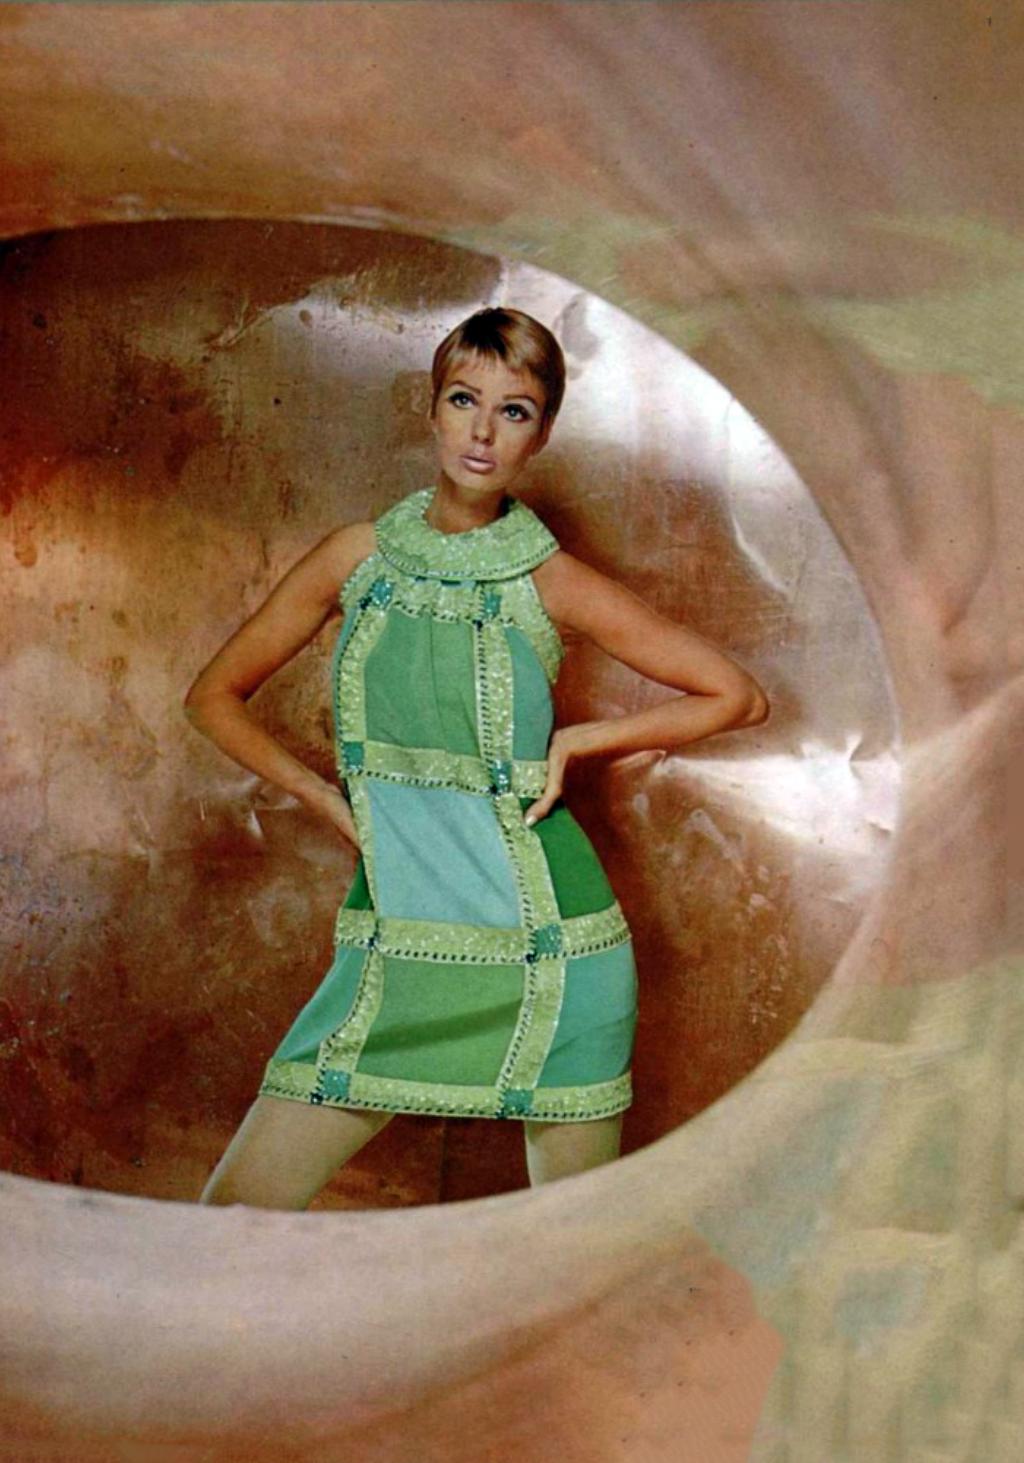 new high newest most popular Pierre Cardin. L'Officiel magazine 1967 | 1960s Fashion ...